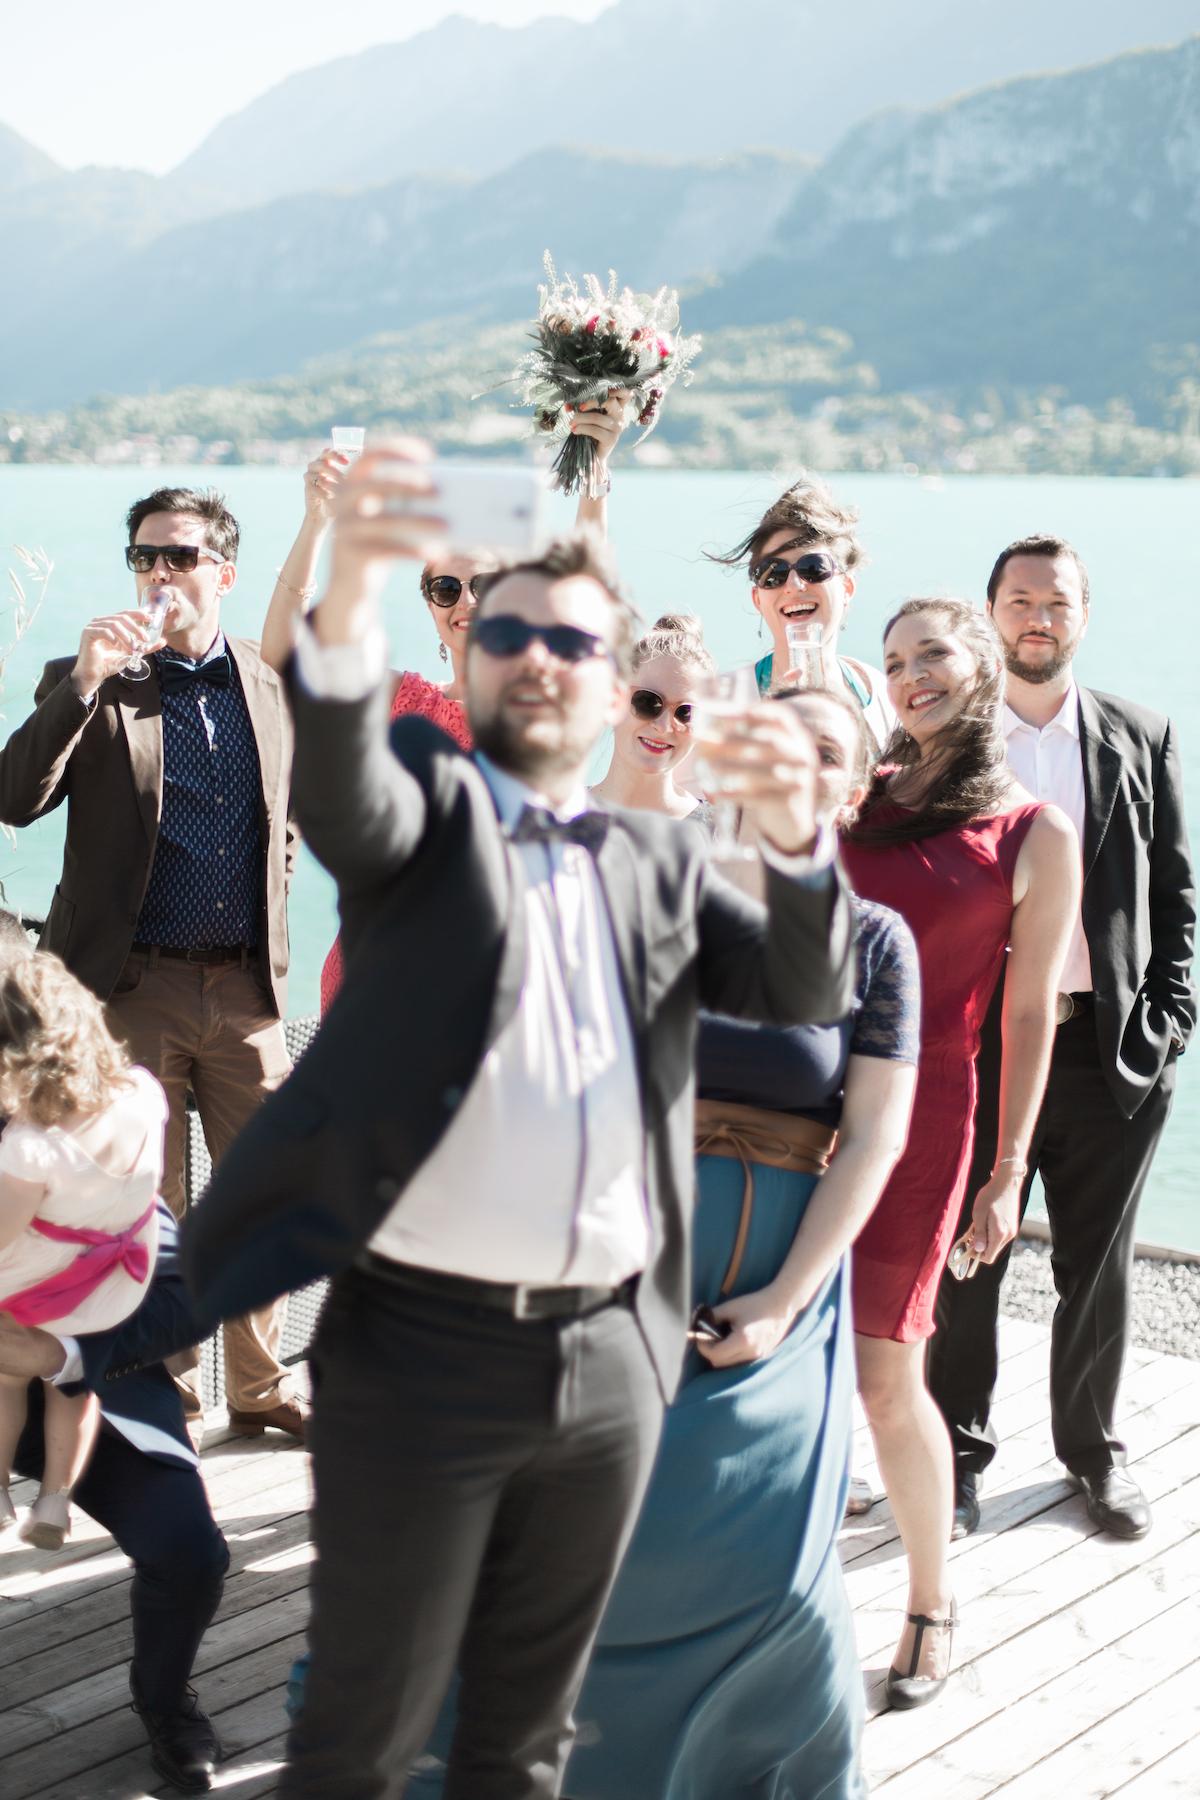 annecy-wedding-photos-159.jpg